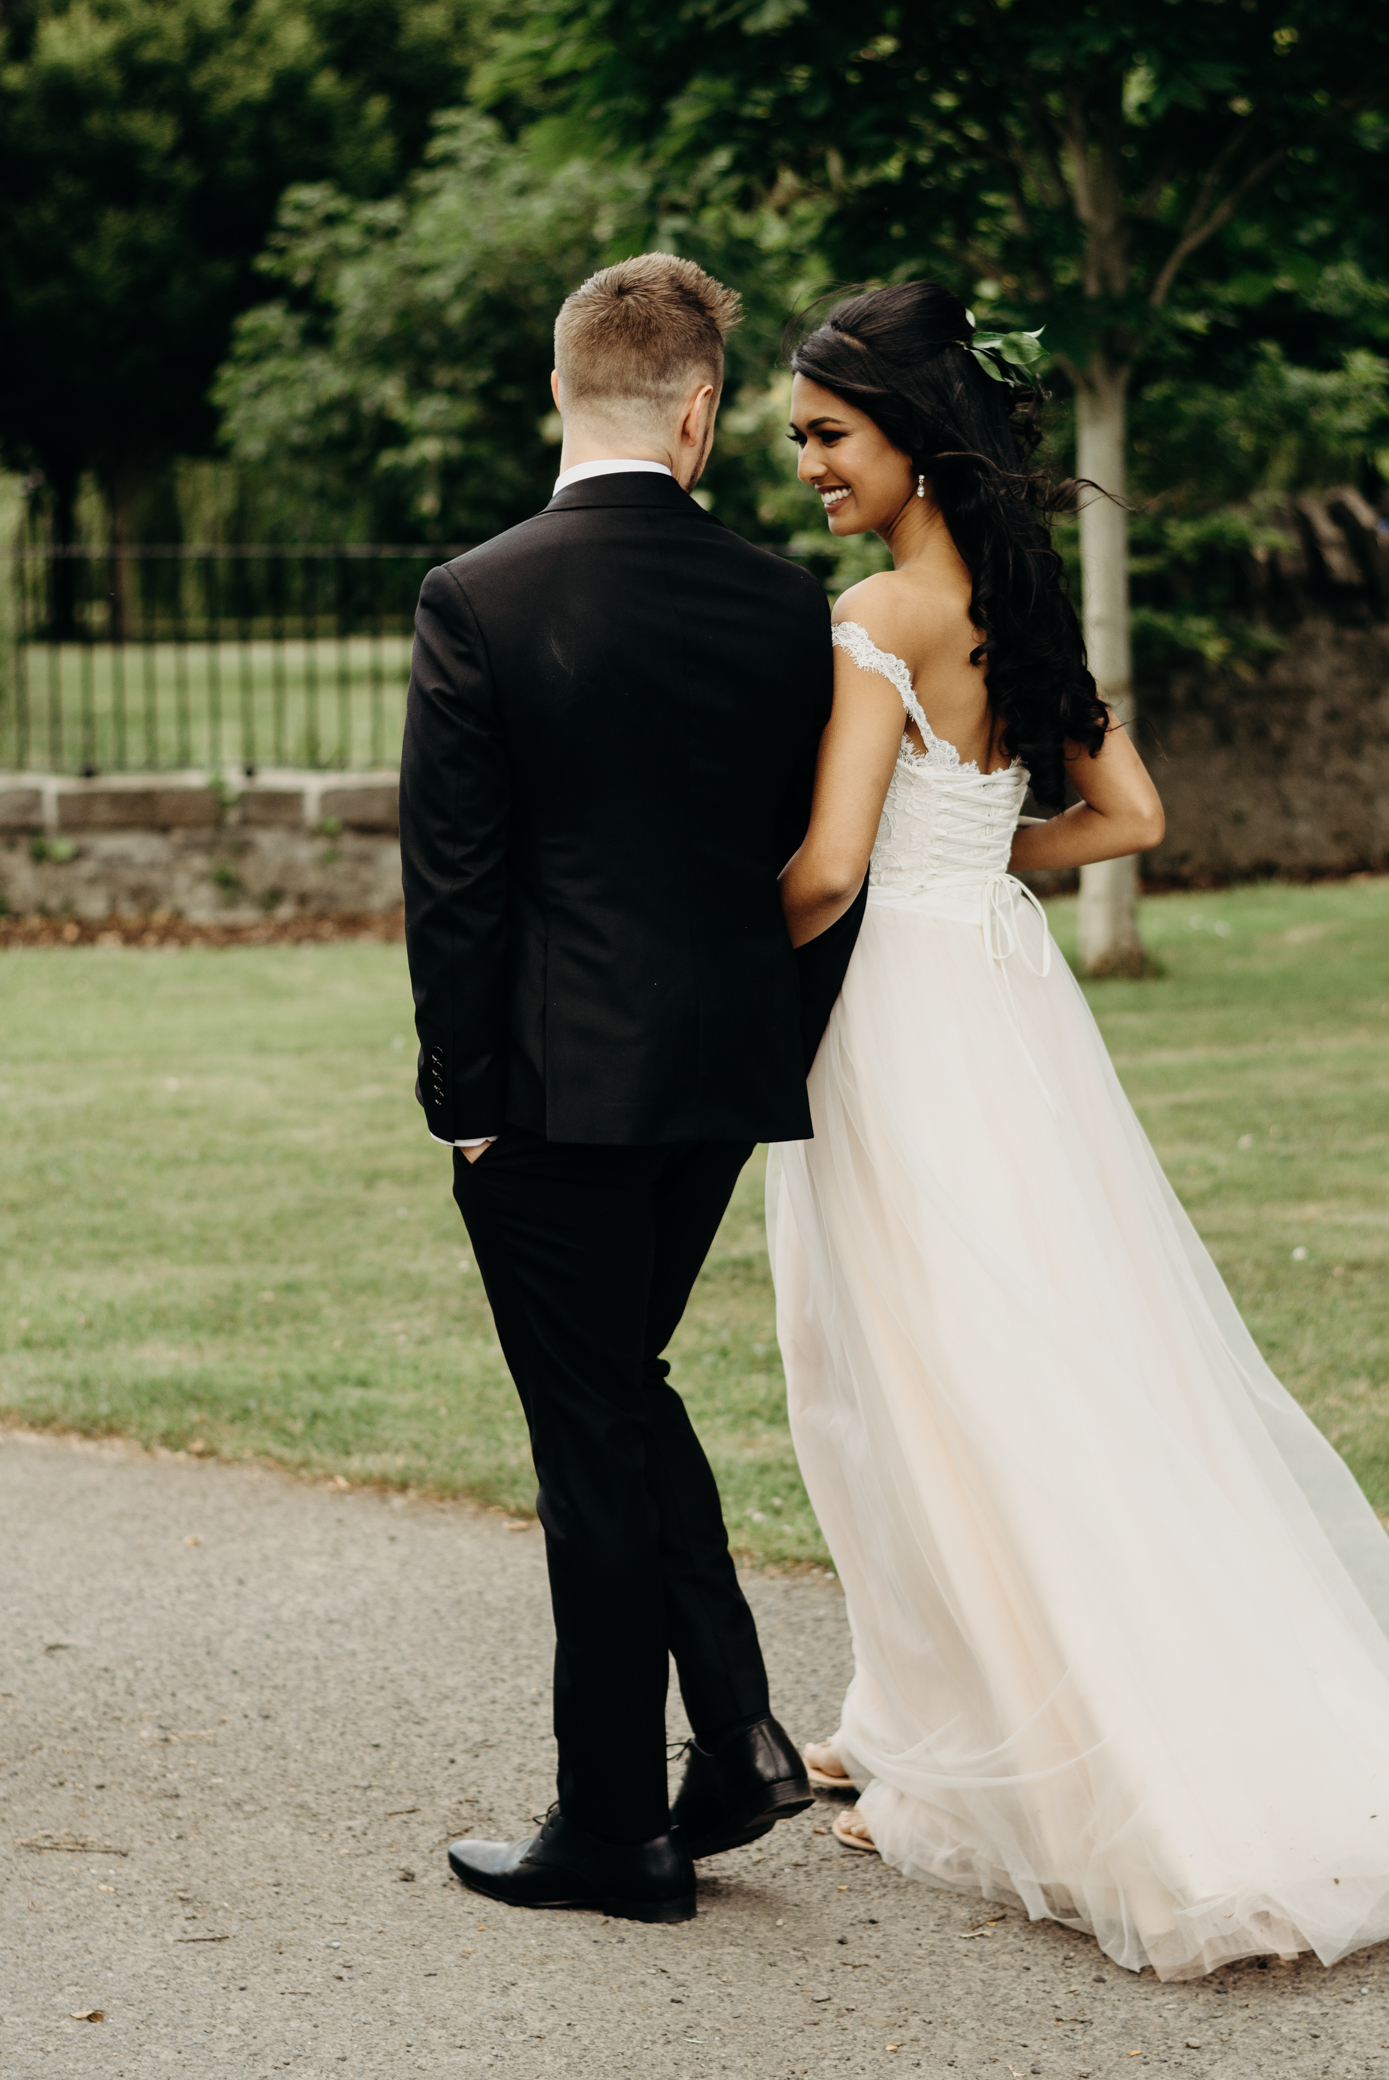 Alan&Naz- Barberstown Castle Wedding - Wedding photographer Ireland-123.jpg